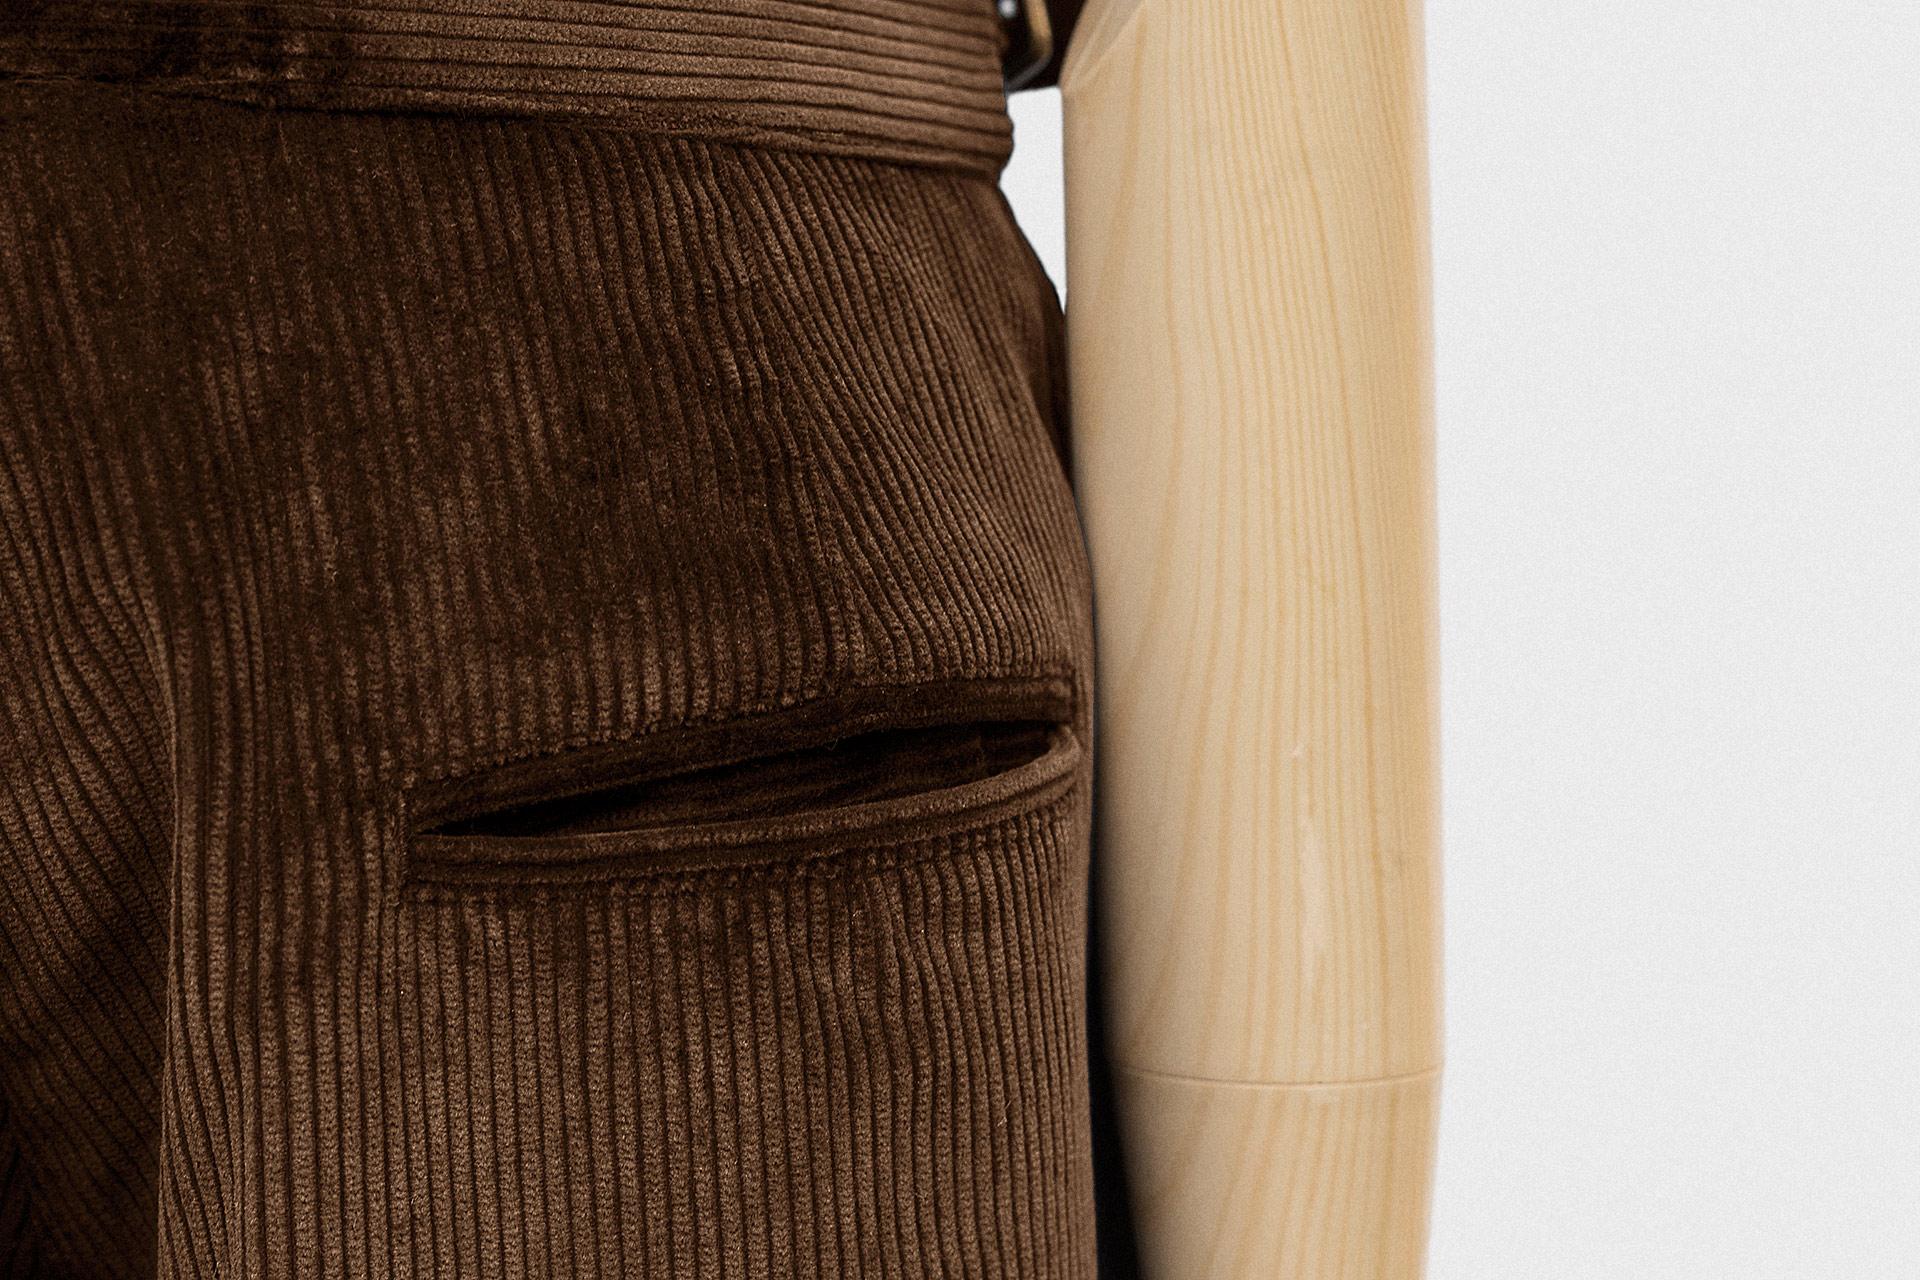 standard-trouser-heavy-corduroy-cedar-11@2x.jpg